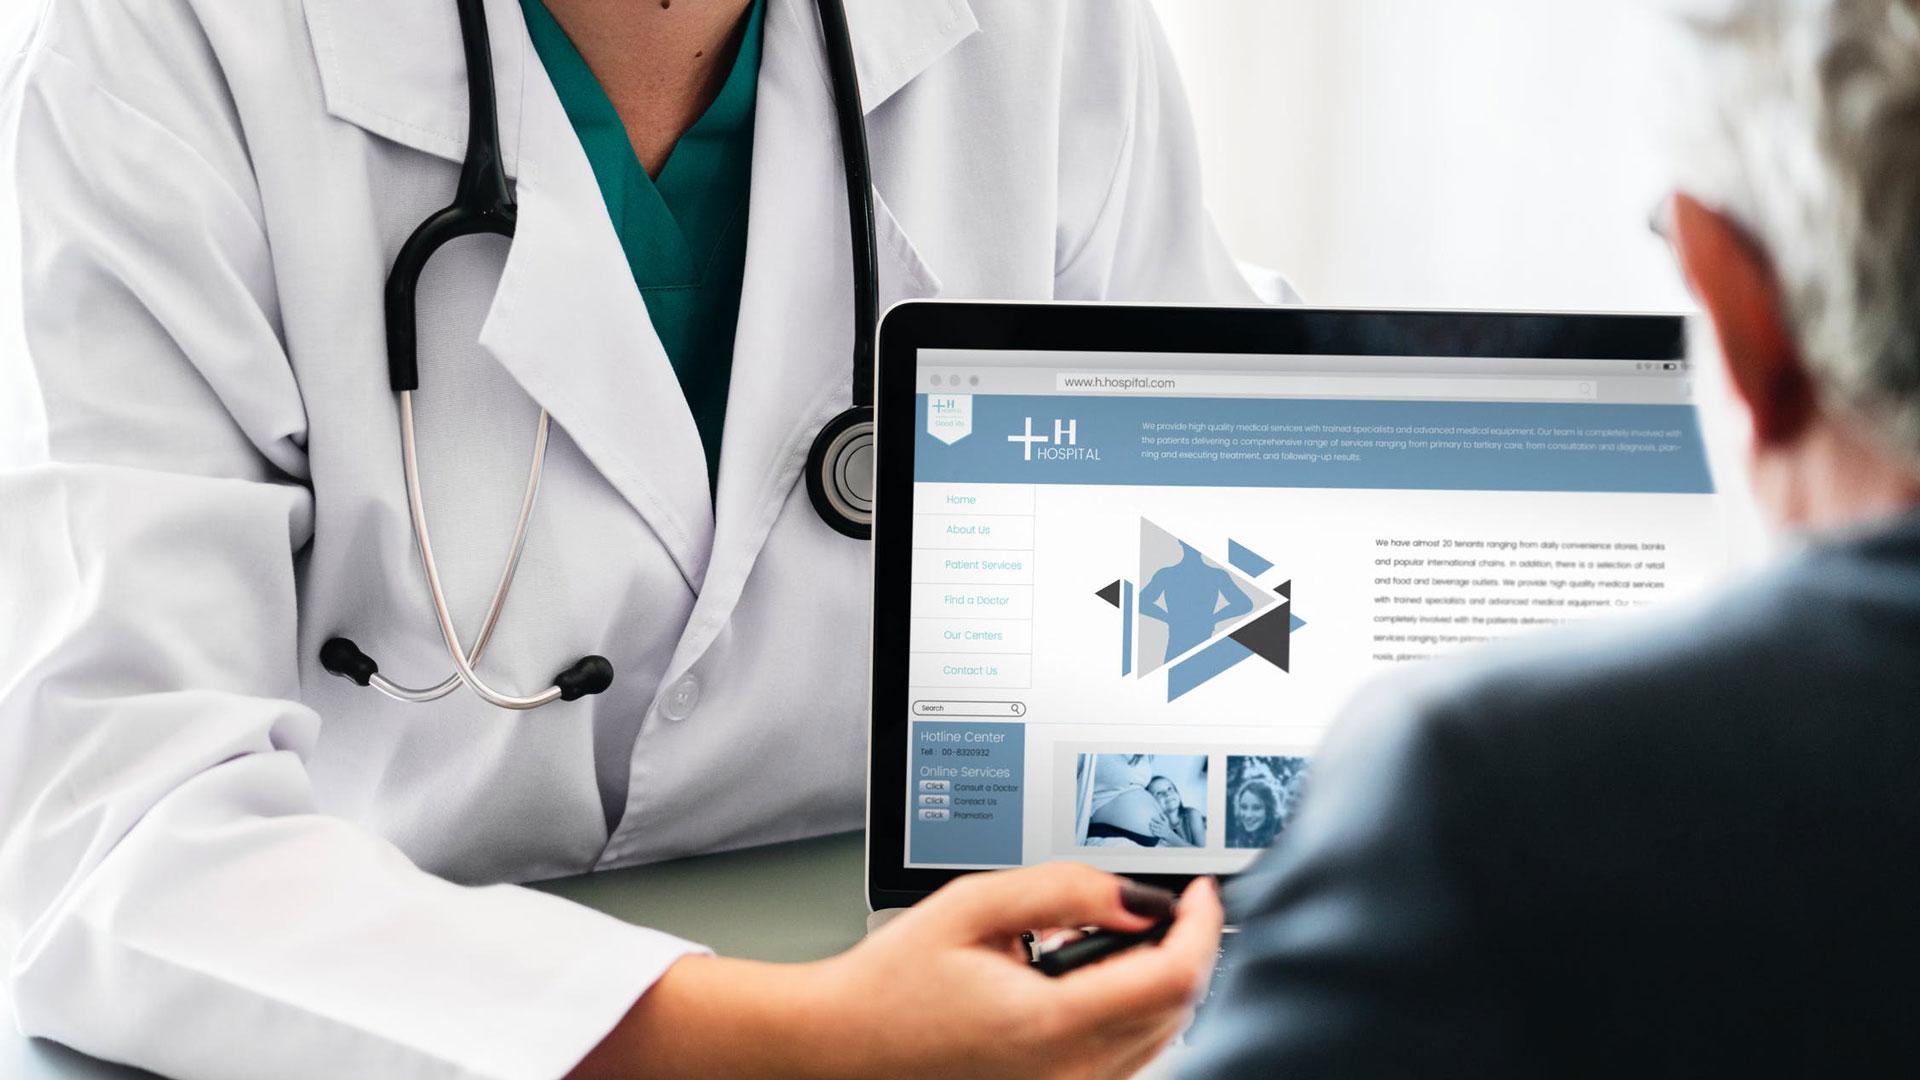 Medical-Image-Cloud-Storage-on-DailyMirrorToday